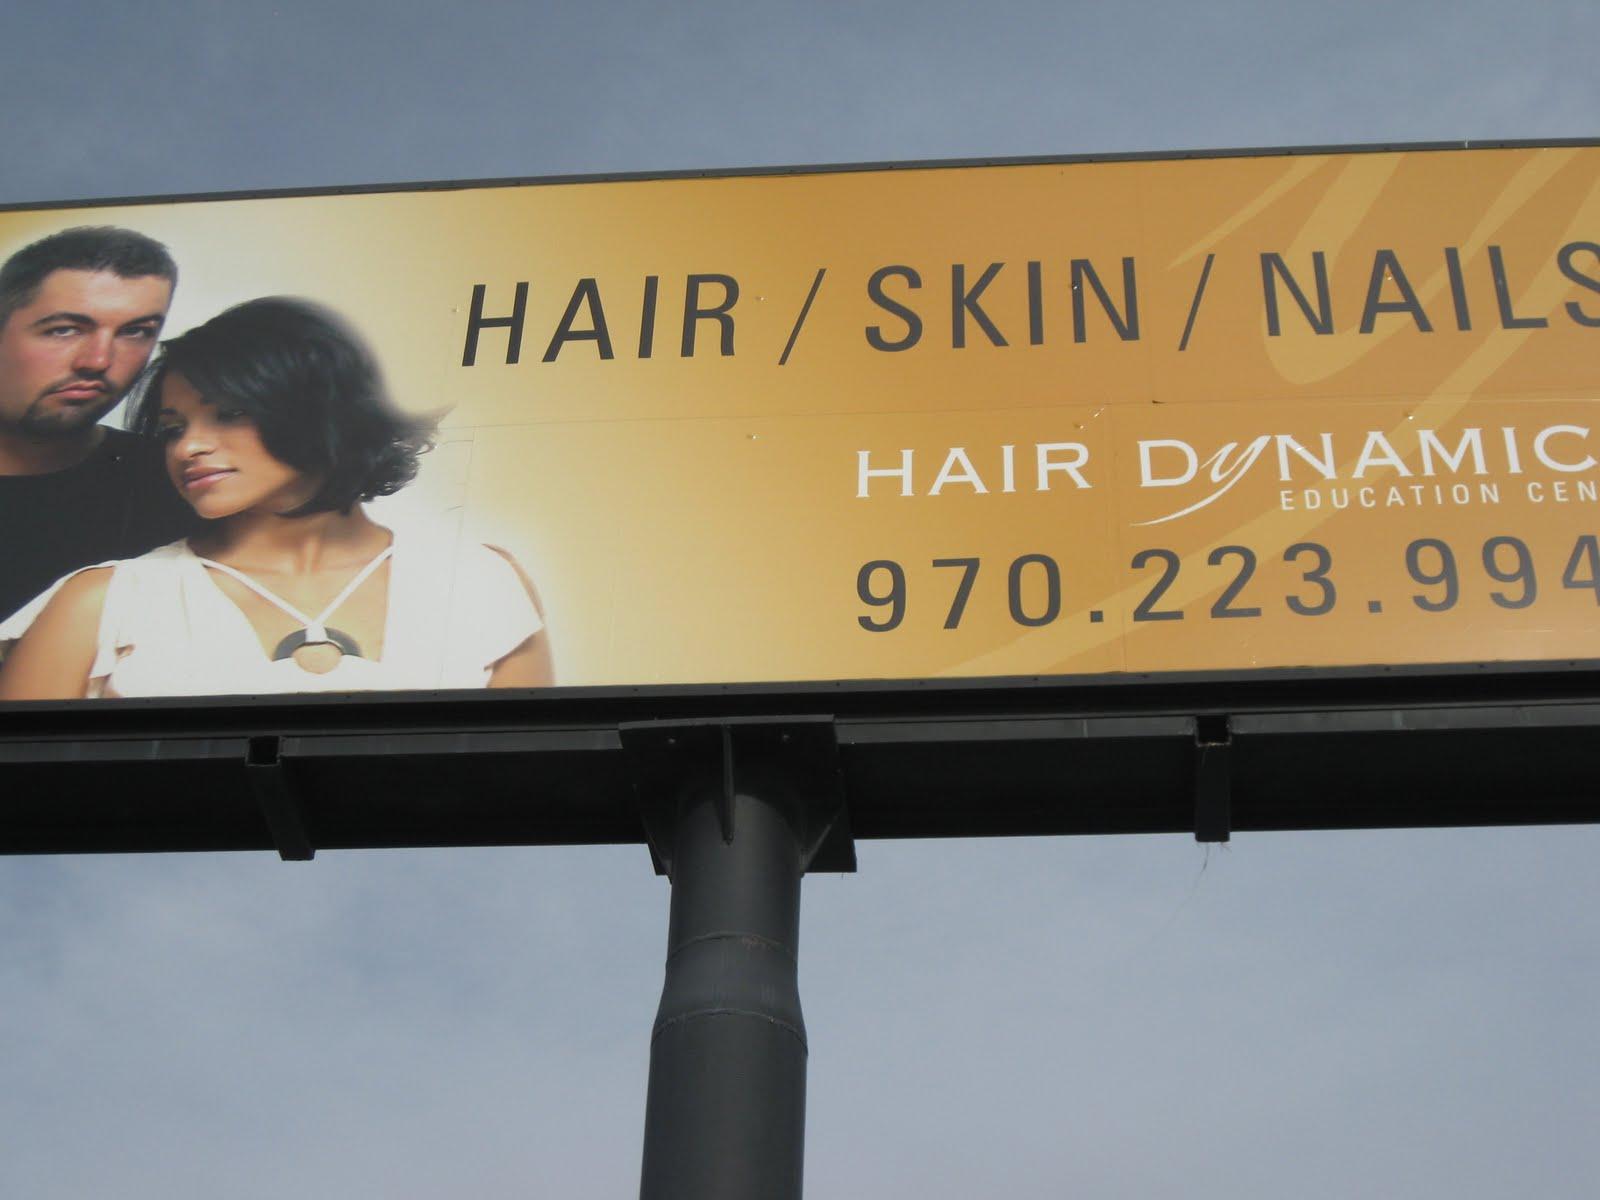 Choice City Native Week 15 Beauty School Haircut